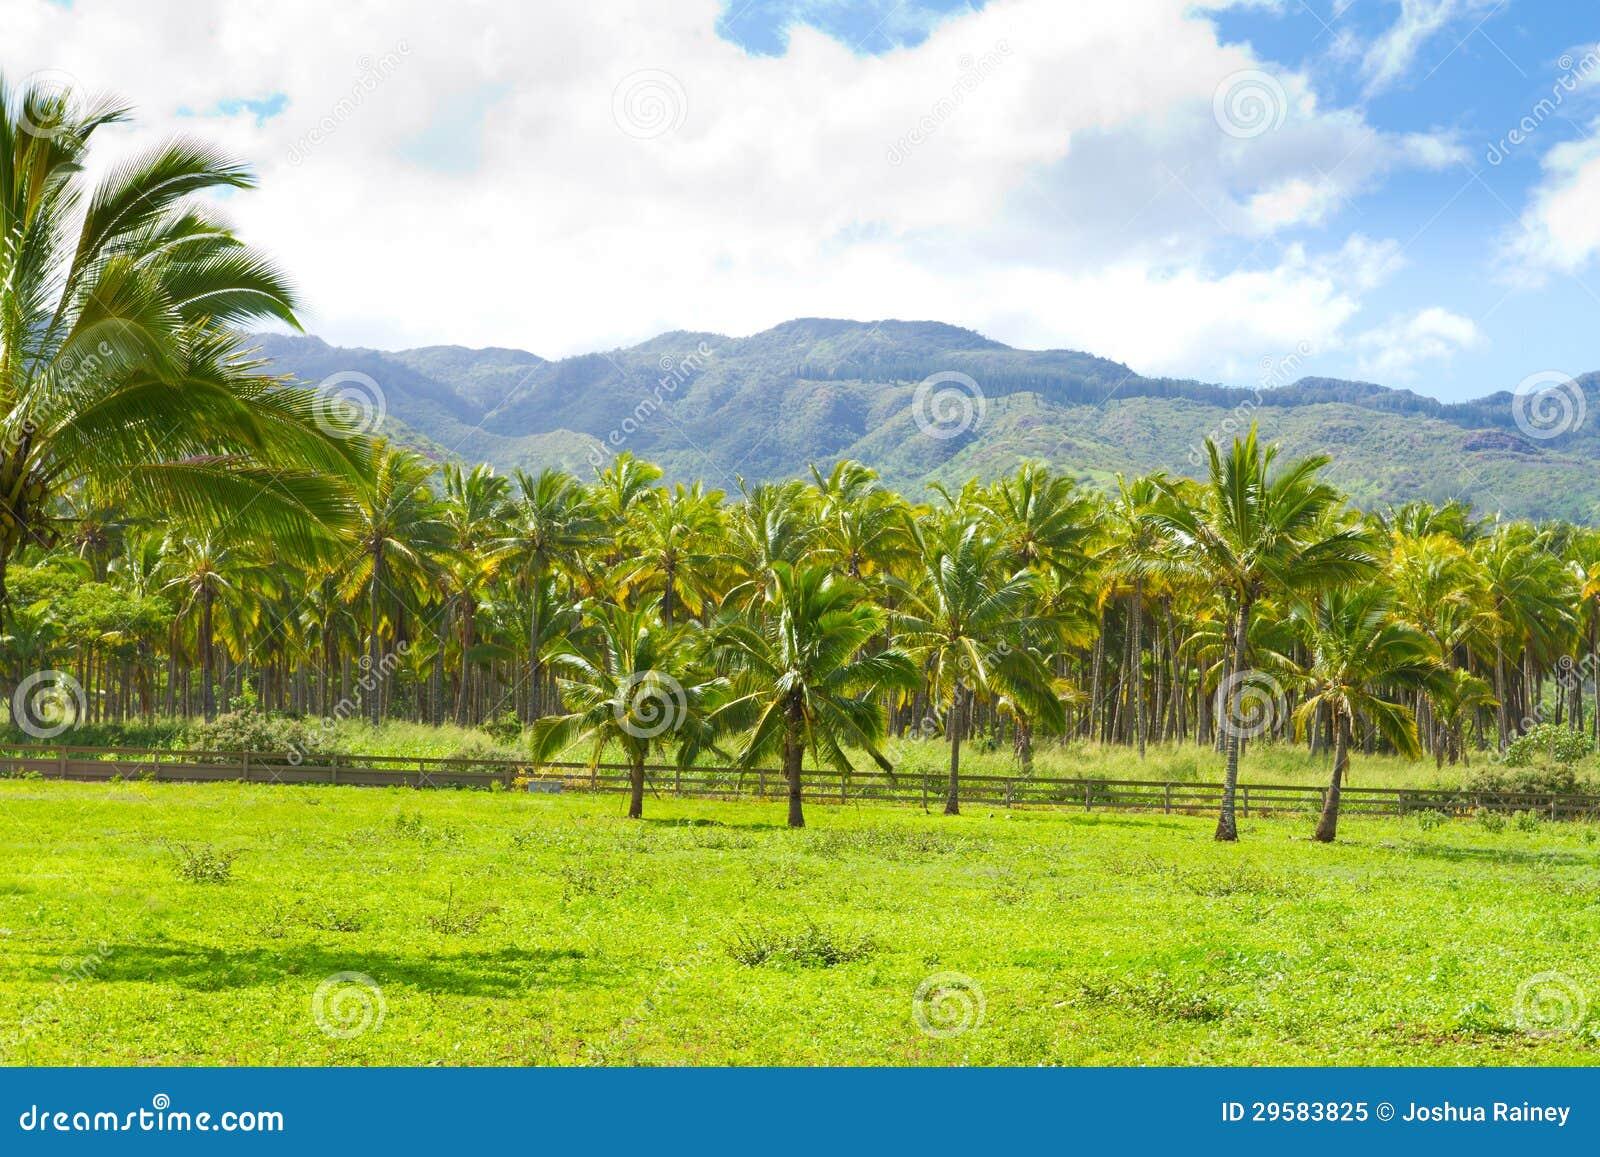 Frangipani spa flowers stock photo image 14654190 -  Hawaii Palm Tree Coconut Farm Royalty Free Stock Photo Image